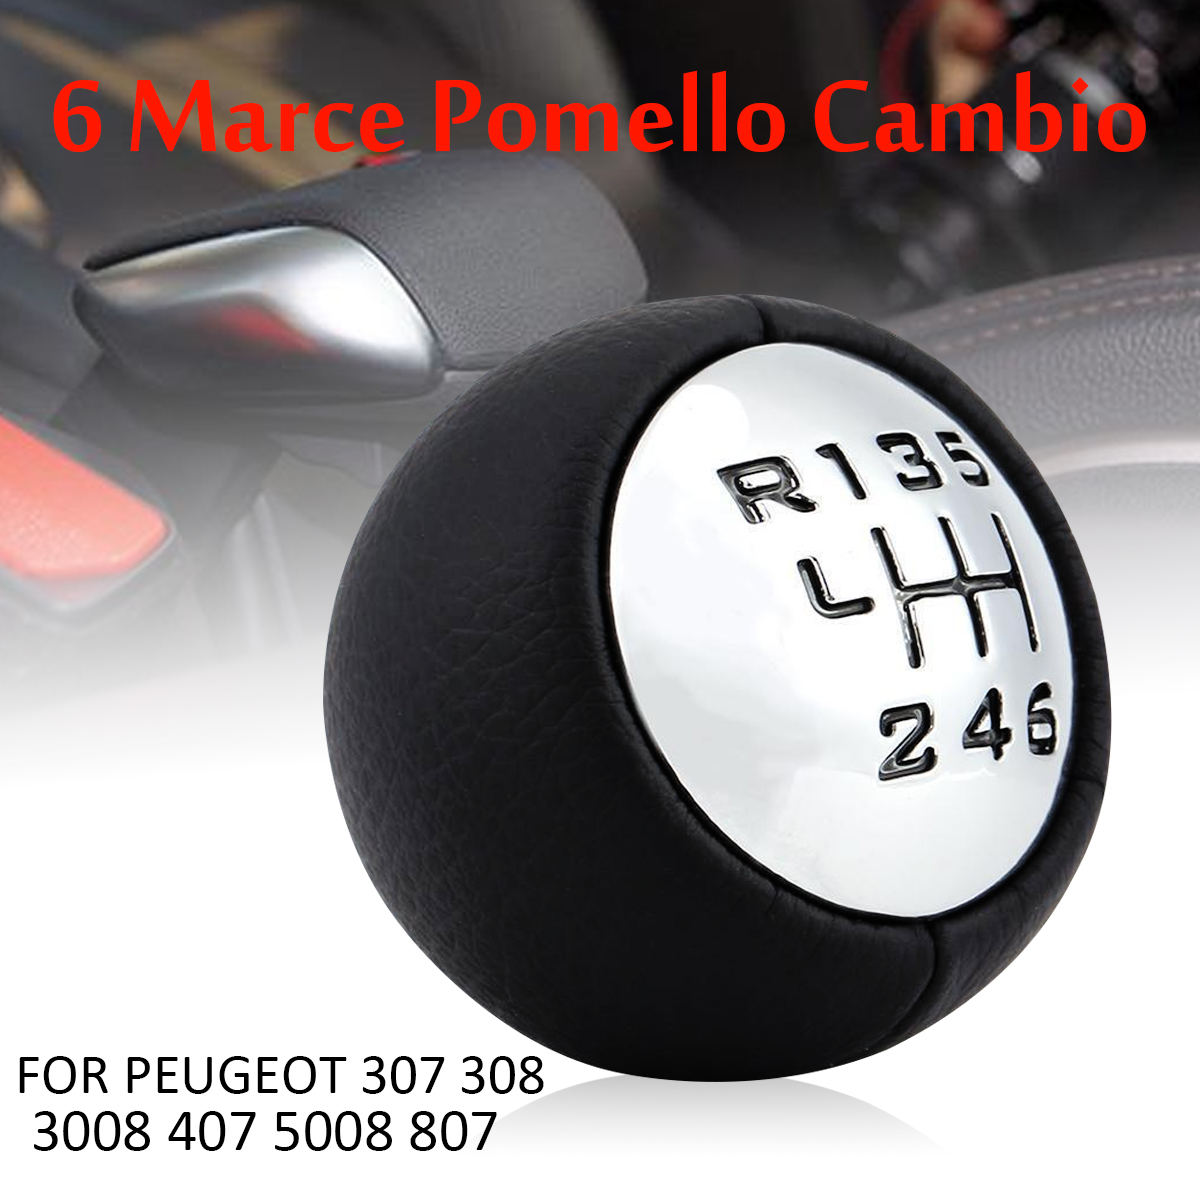 6 Speed Car Gear Shift Knob Shifter Stick Head For Peugeot 307 308 407 Fuse Box 3008 5008